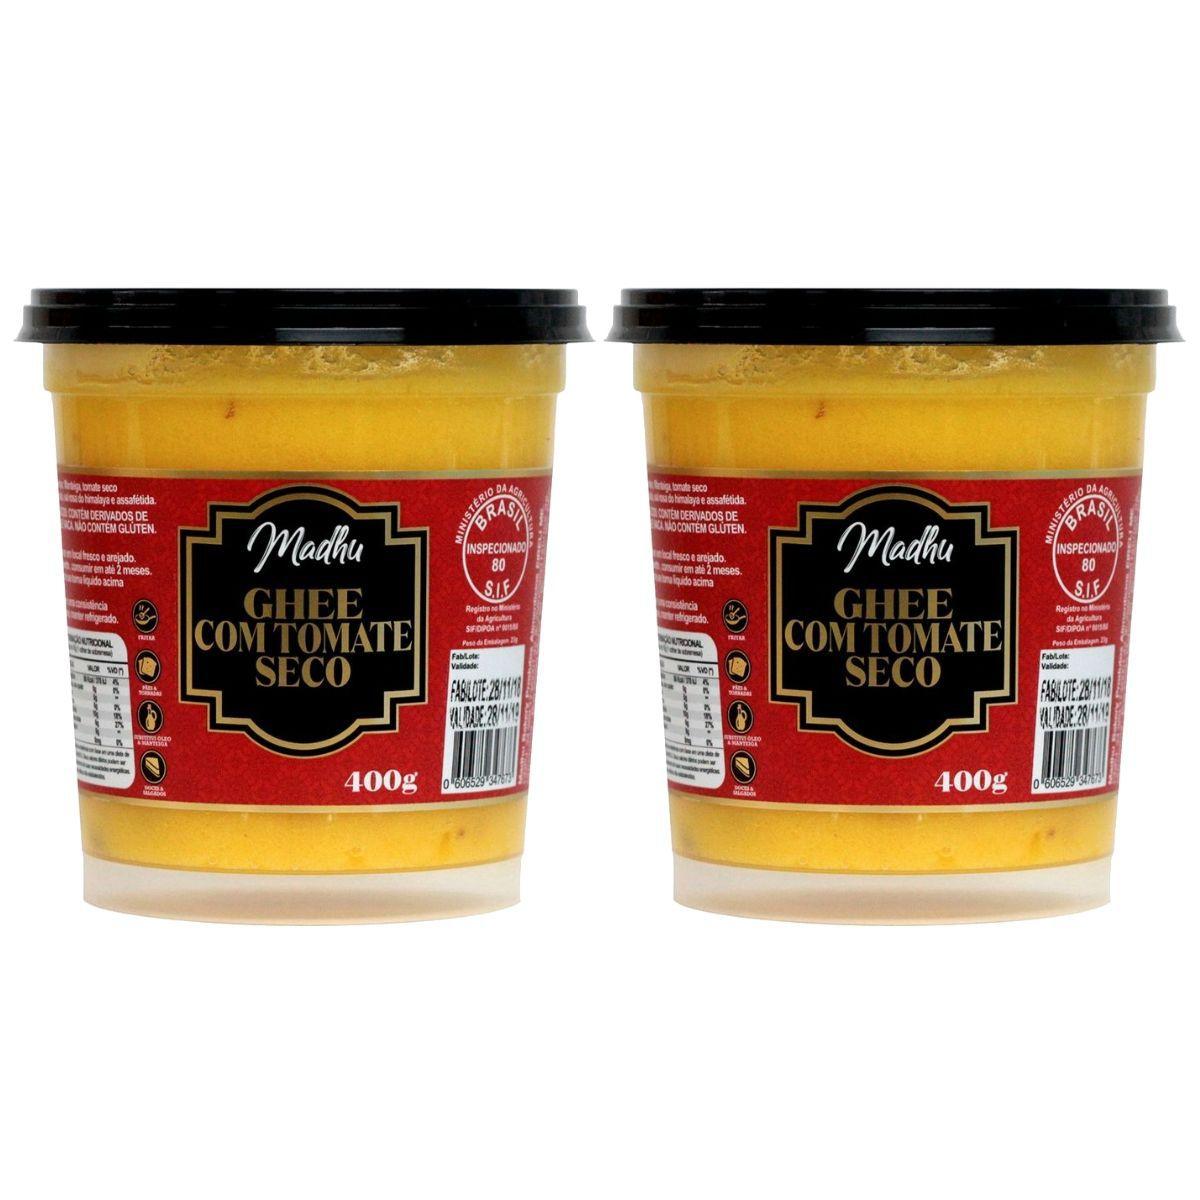 Kit 2 Manteigas Ghee C/ Tomate Seco Clarificada 400mg - Madhu Bakery